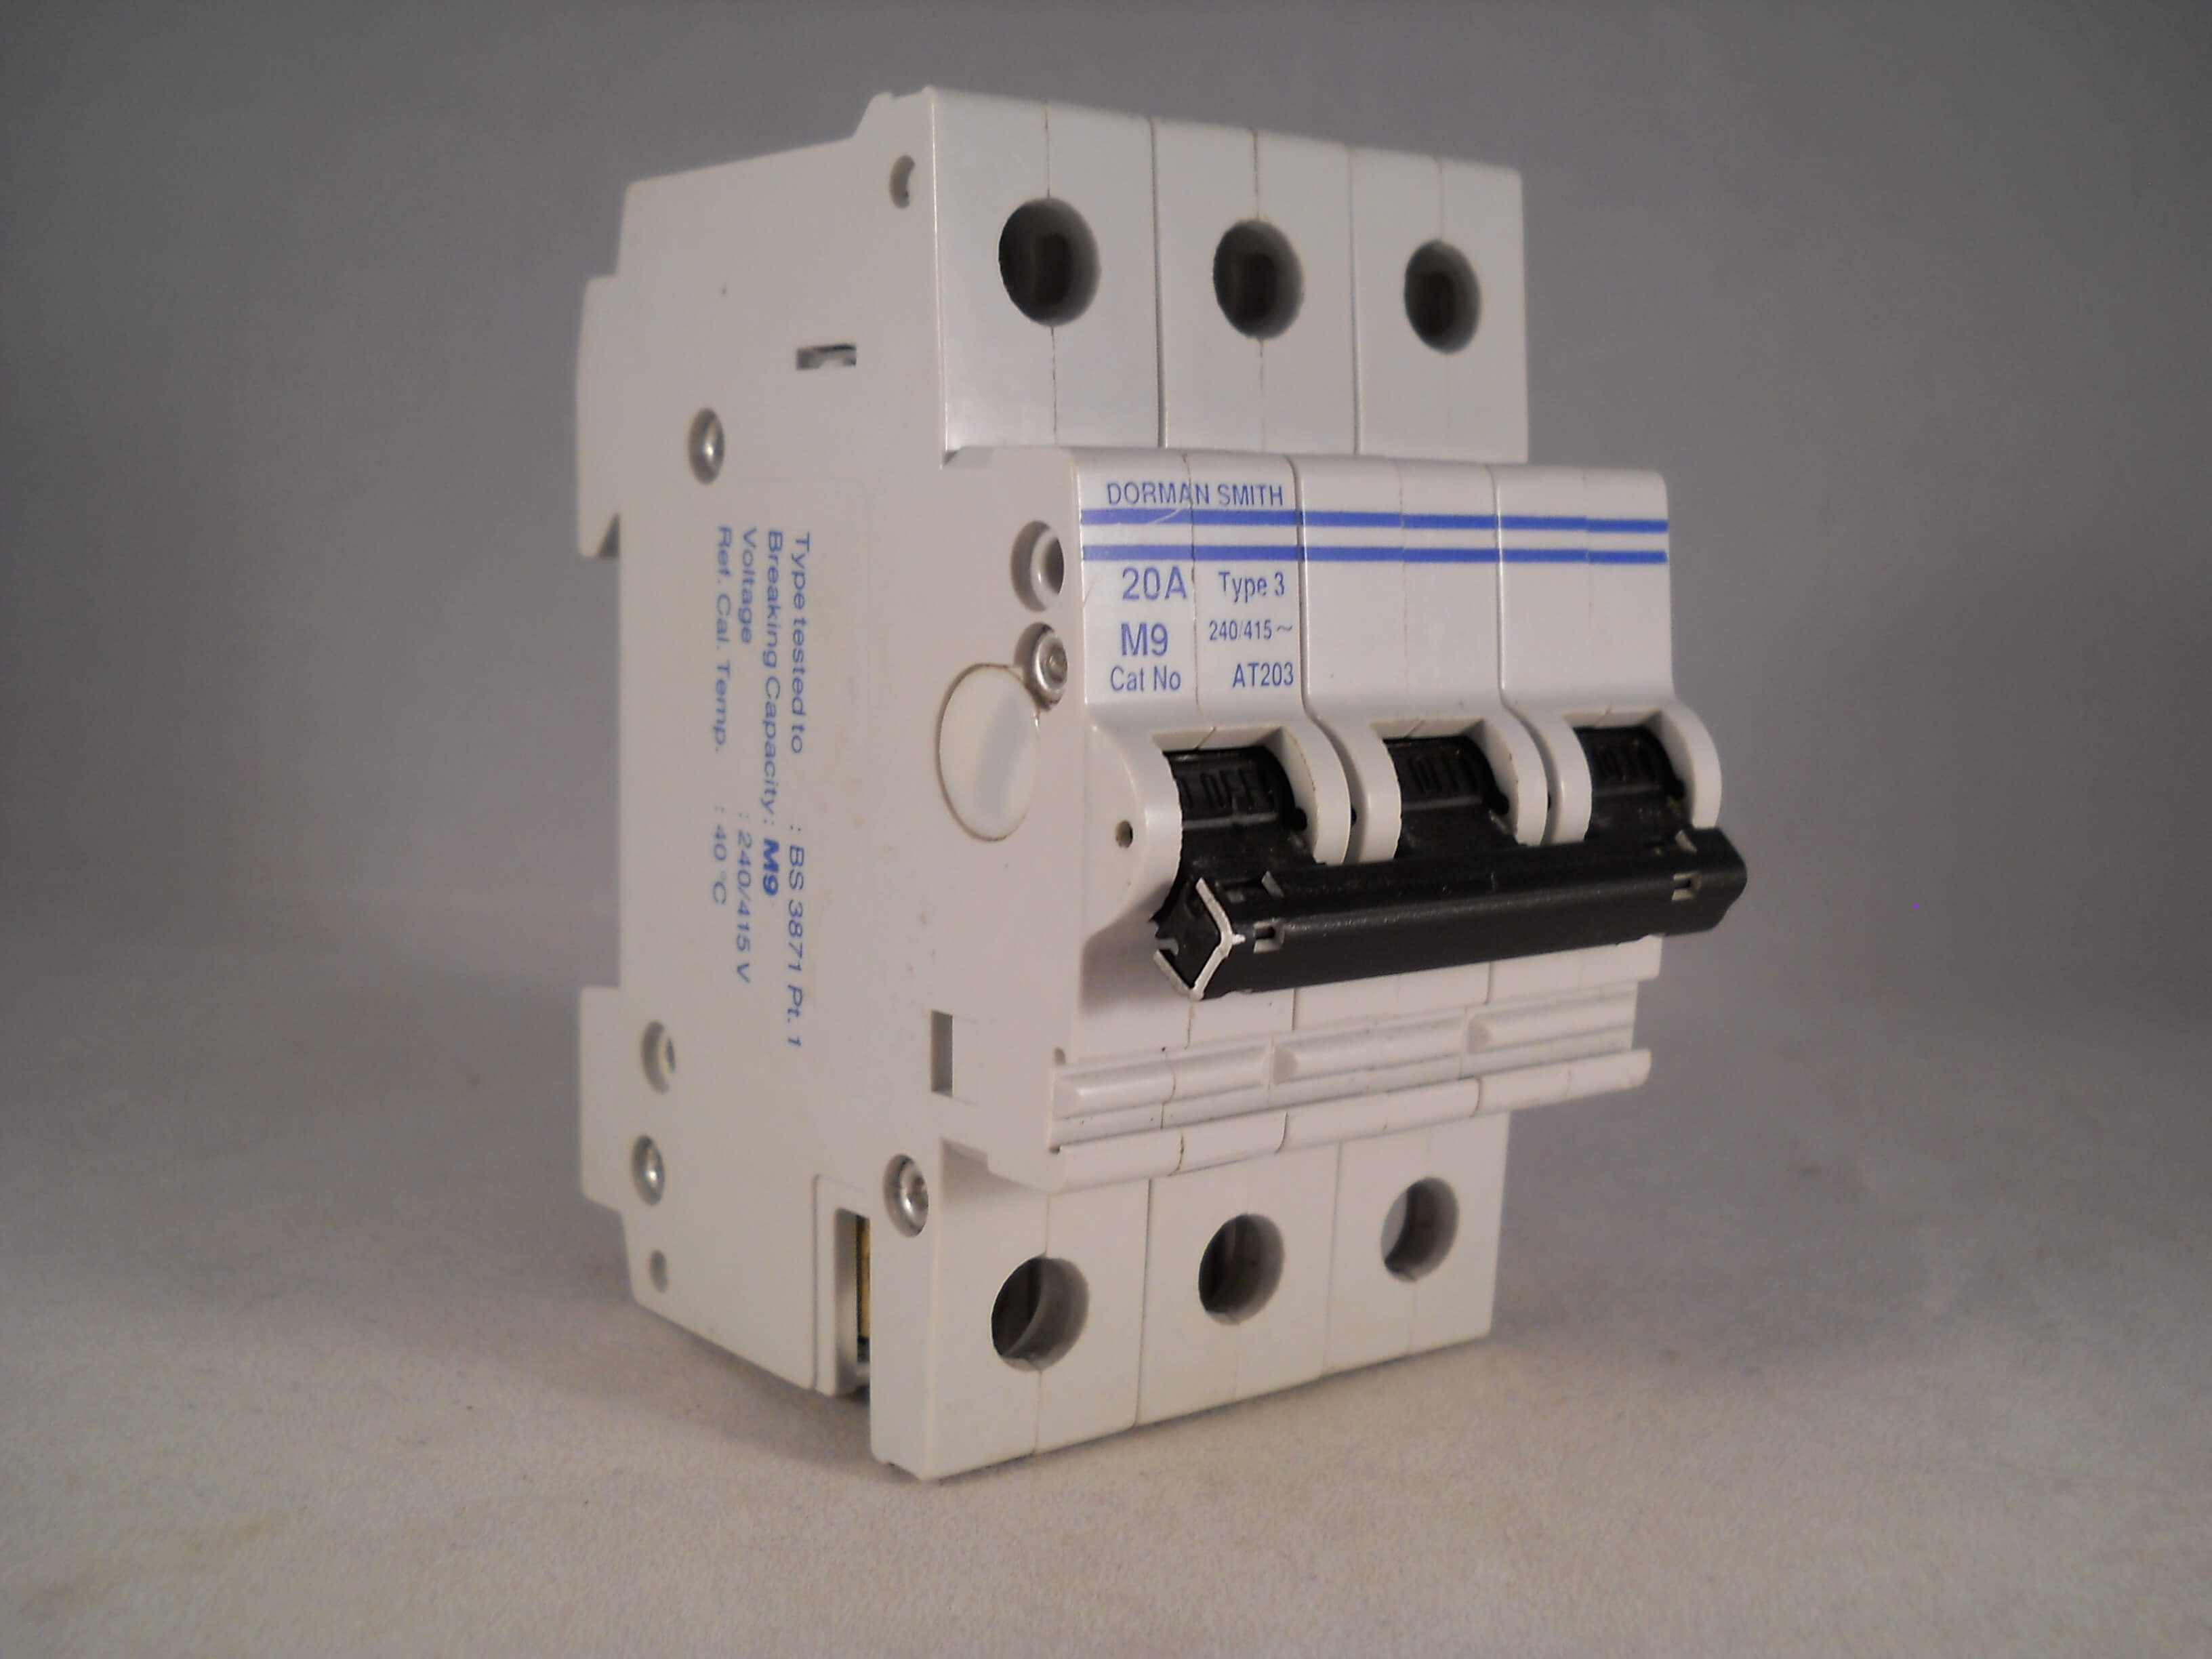 Dorman Smith MCB 20 Amp Type 3 M9 20A Triple Pole 3 Phase Breaker ...